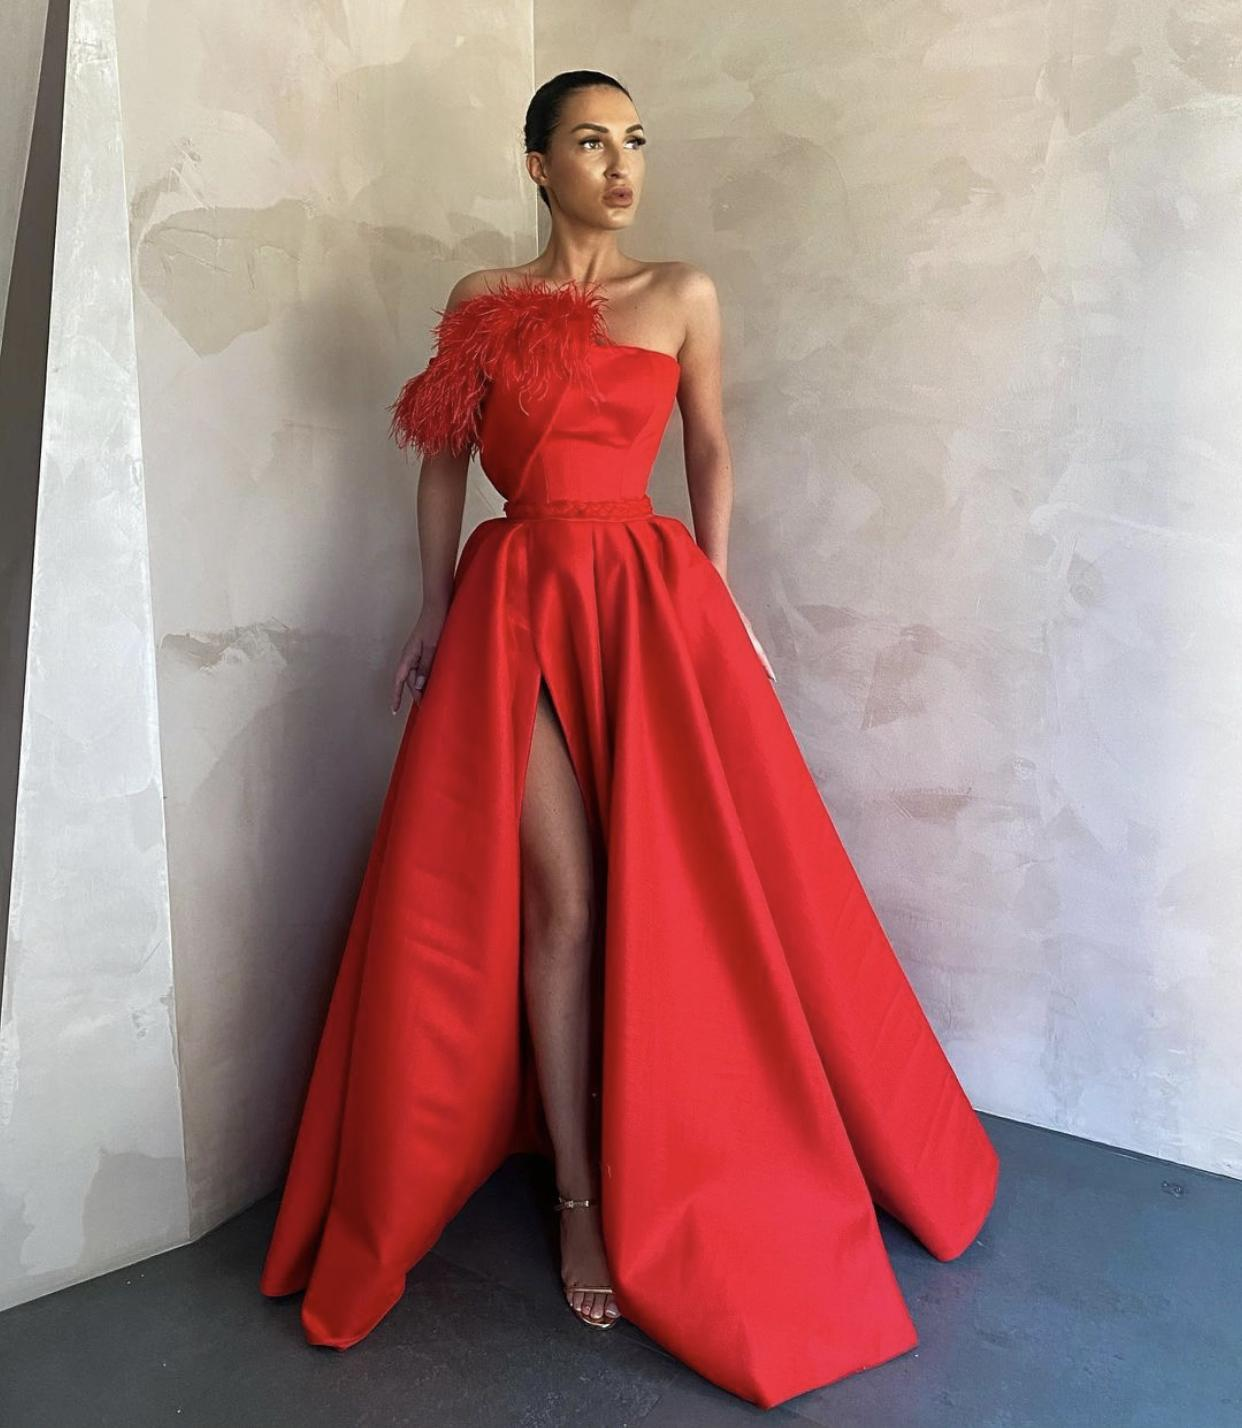 2021 Neue Schwarze Girl Prom Dresses Royal Blue Feather Quaste Formale Abendkleid Meerjungfrau Partykleider 2k21 Side Split